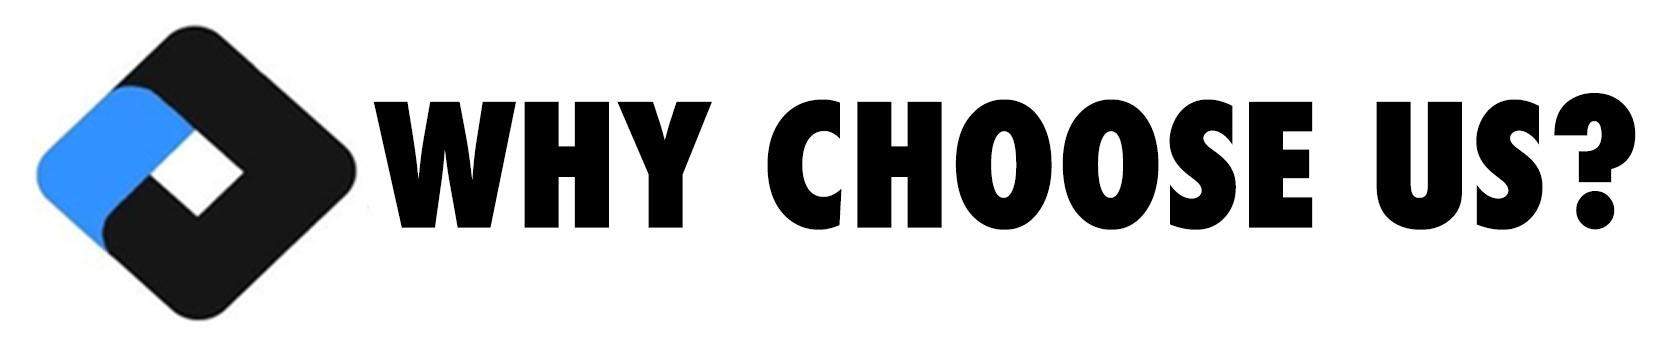 why choose us, accountancy, accountant